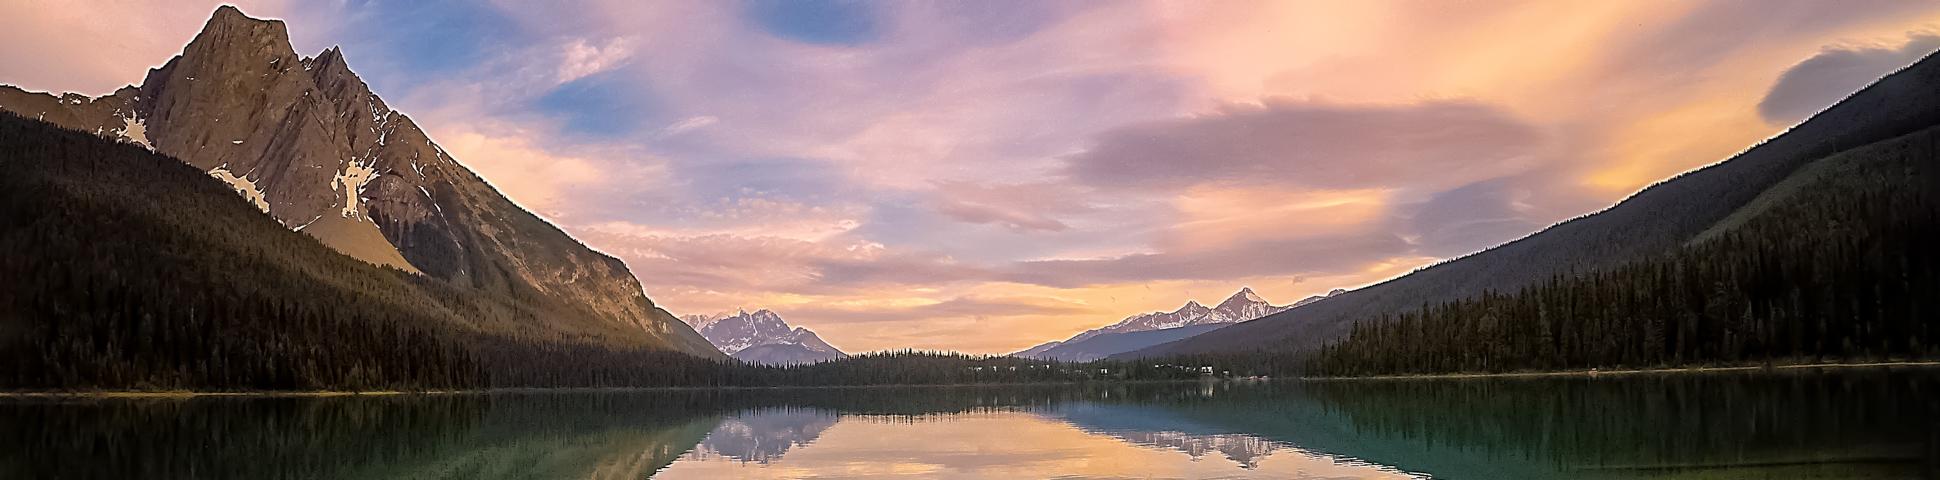 Panoramic view from Banff and Jasper Hiking Tour